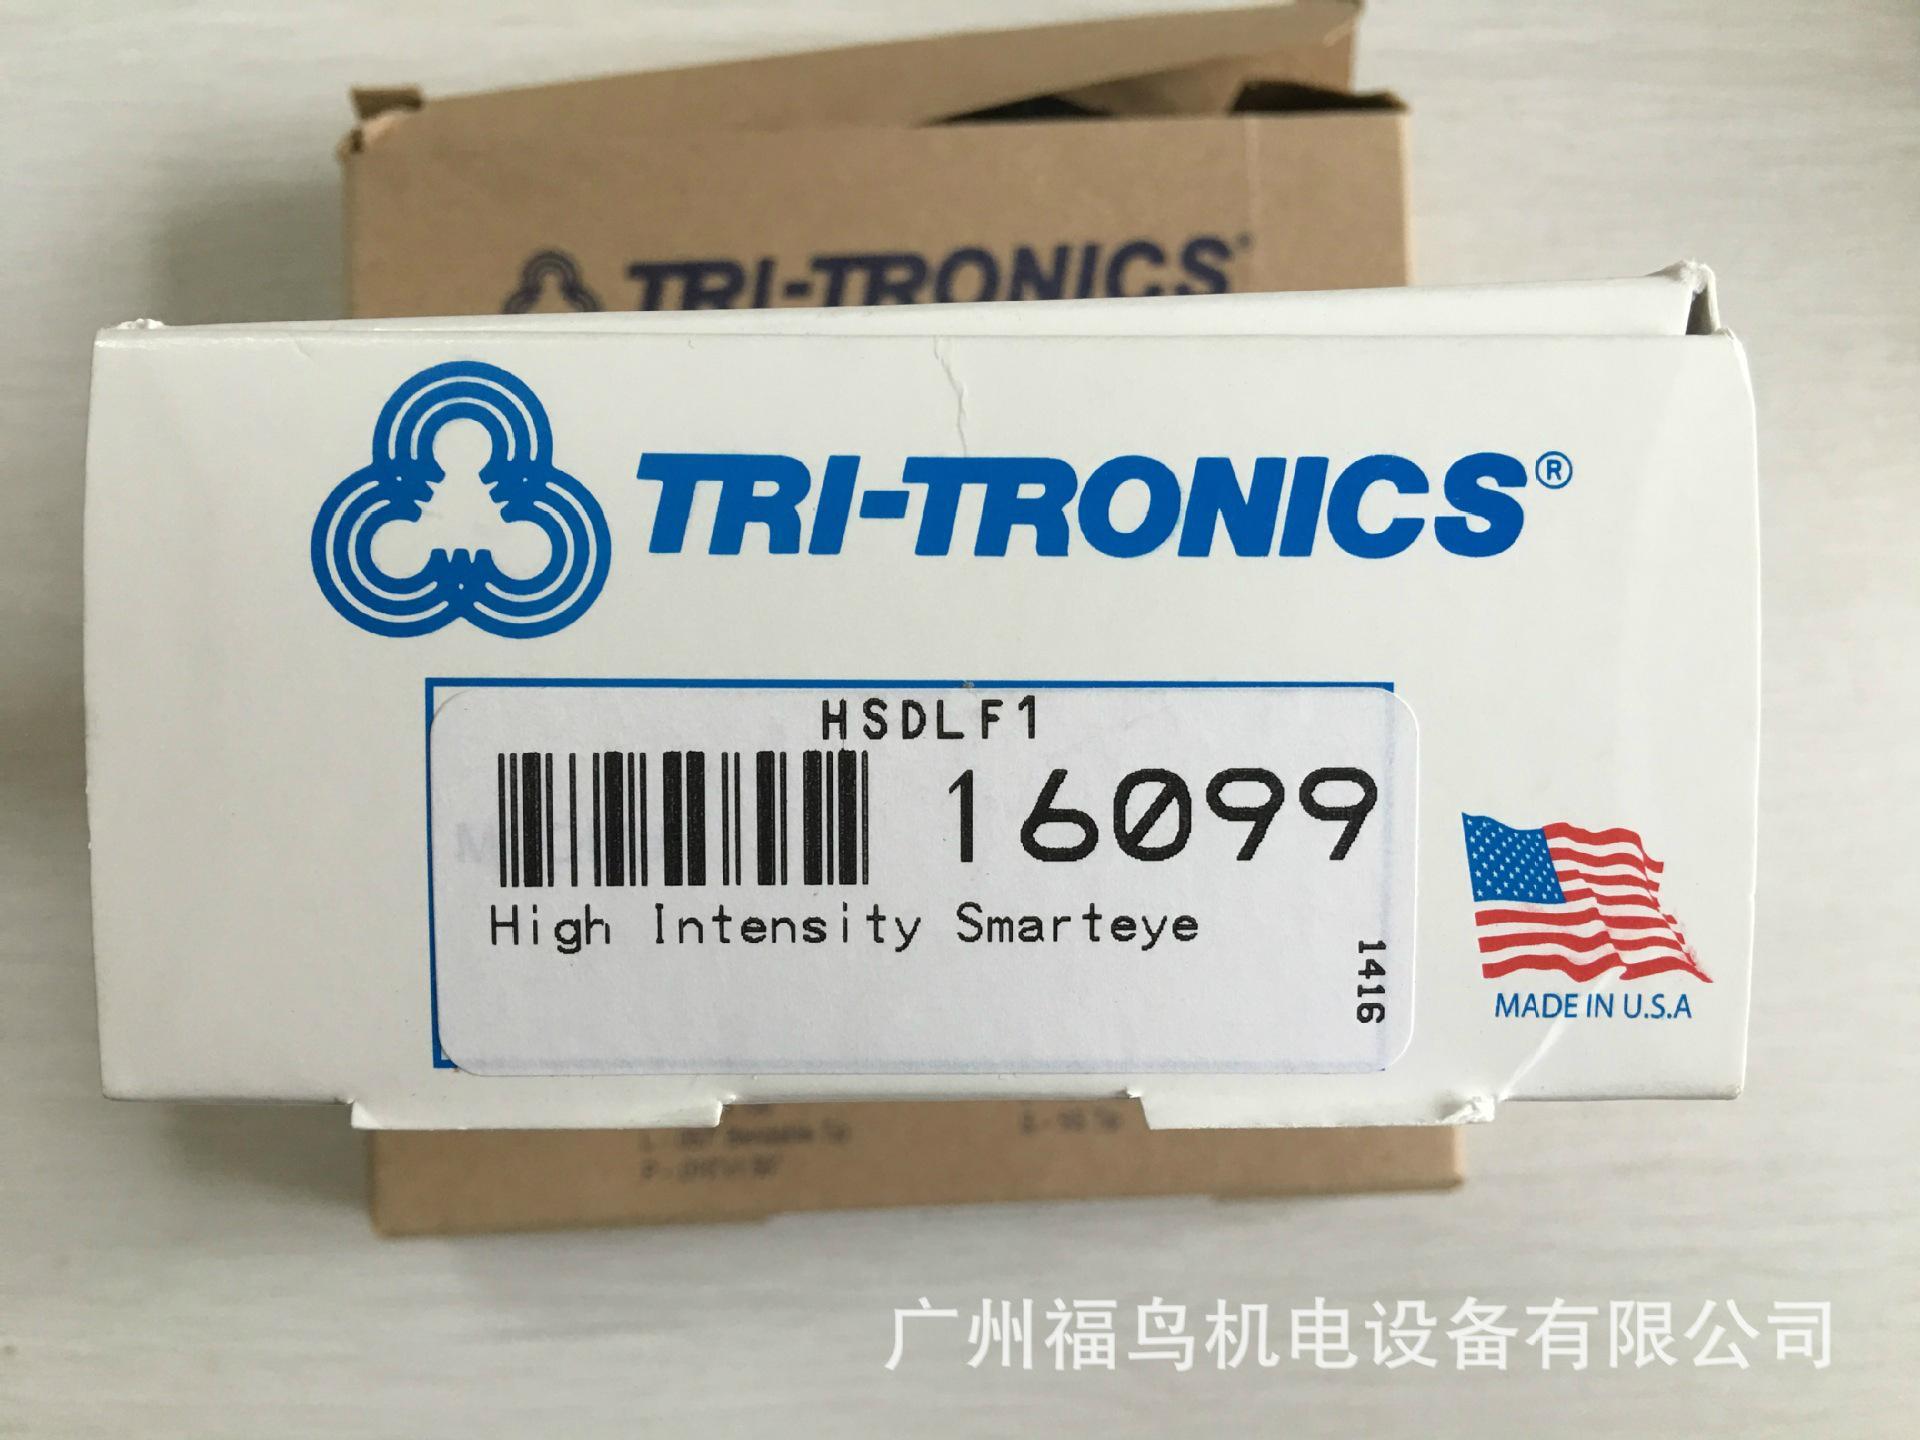 TRI-TRONICS传感器, 型号: HSDLF1